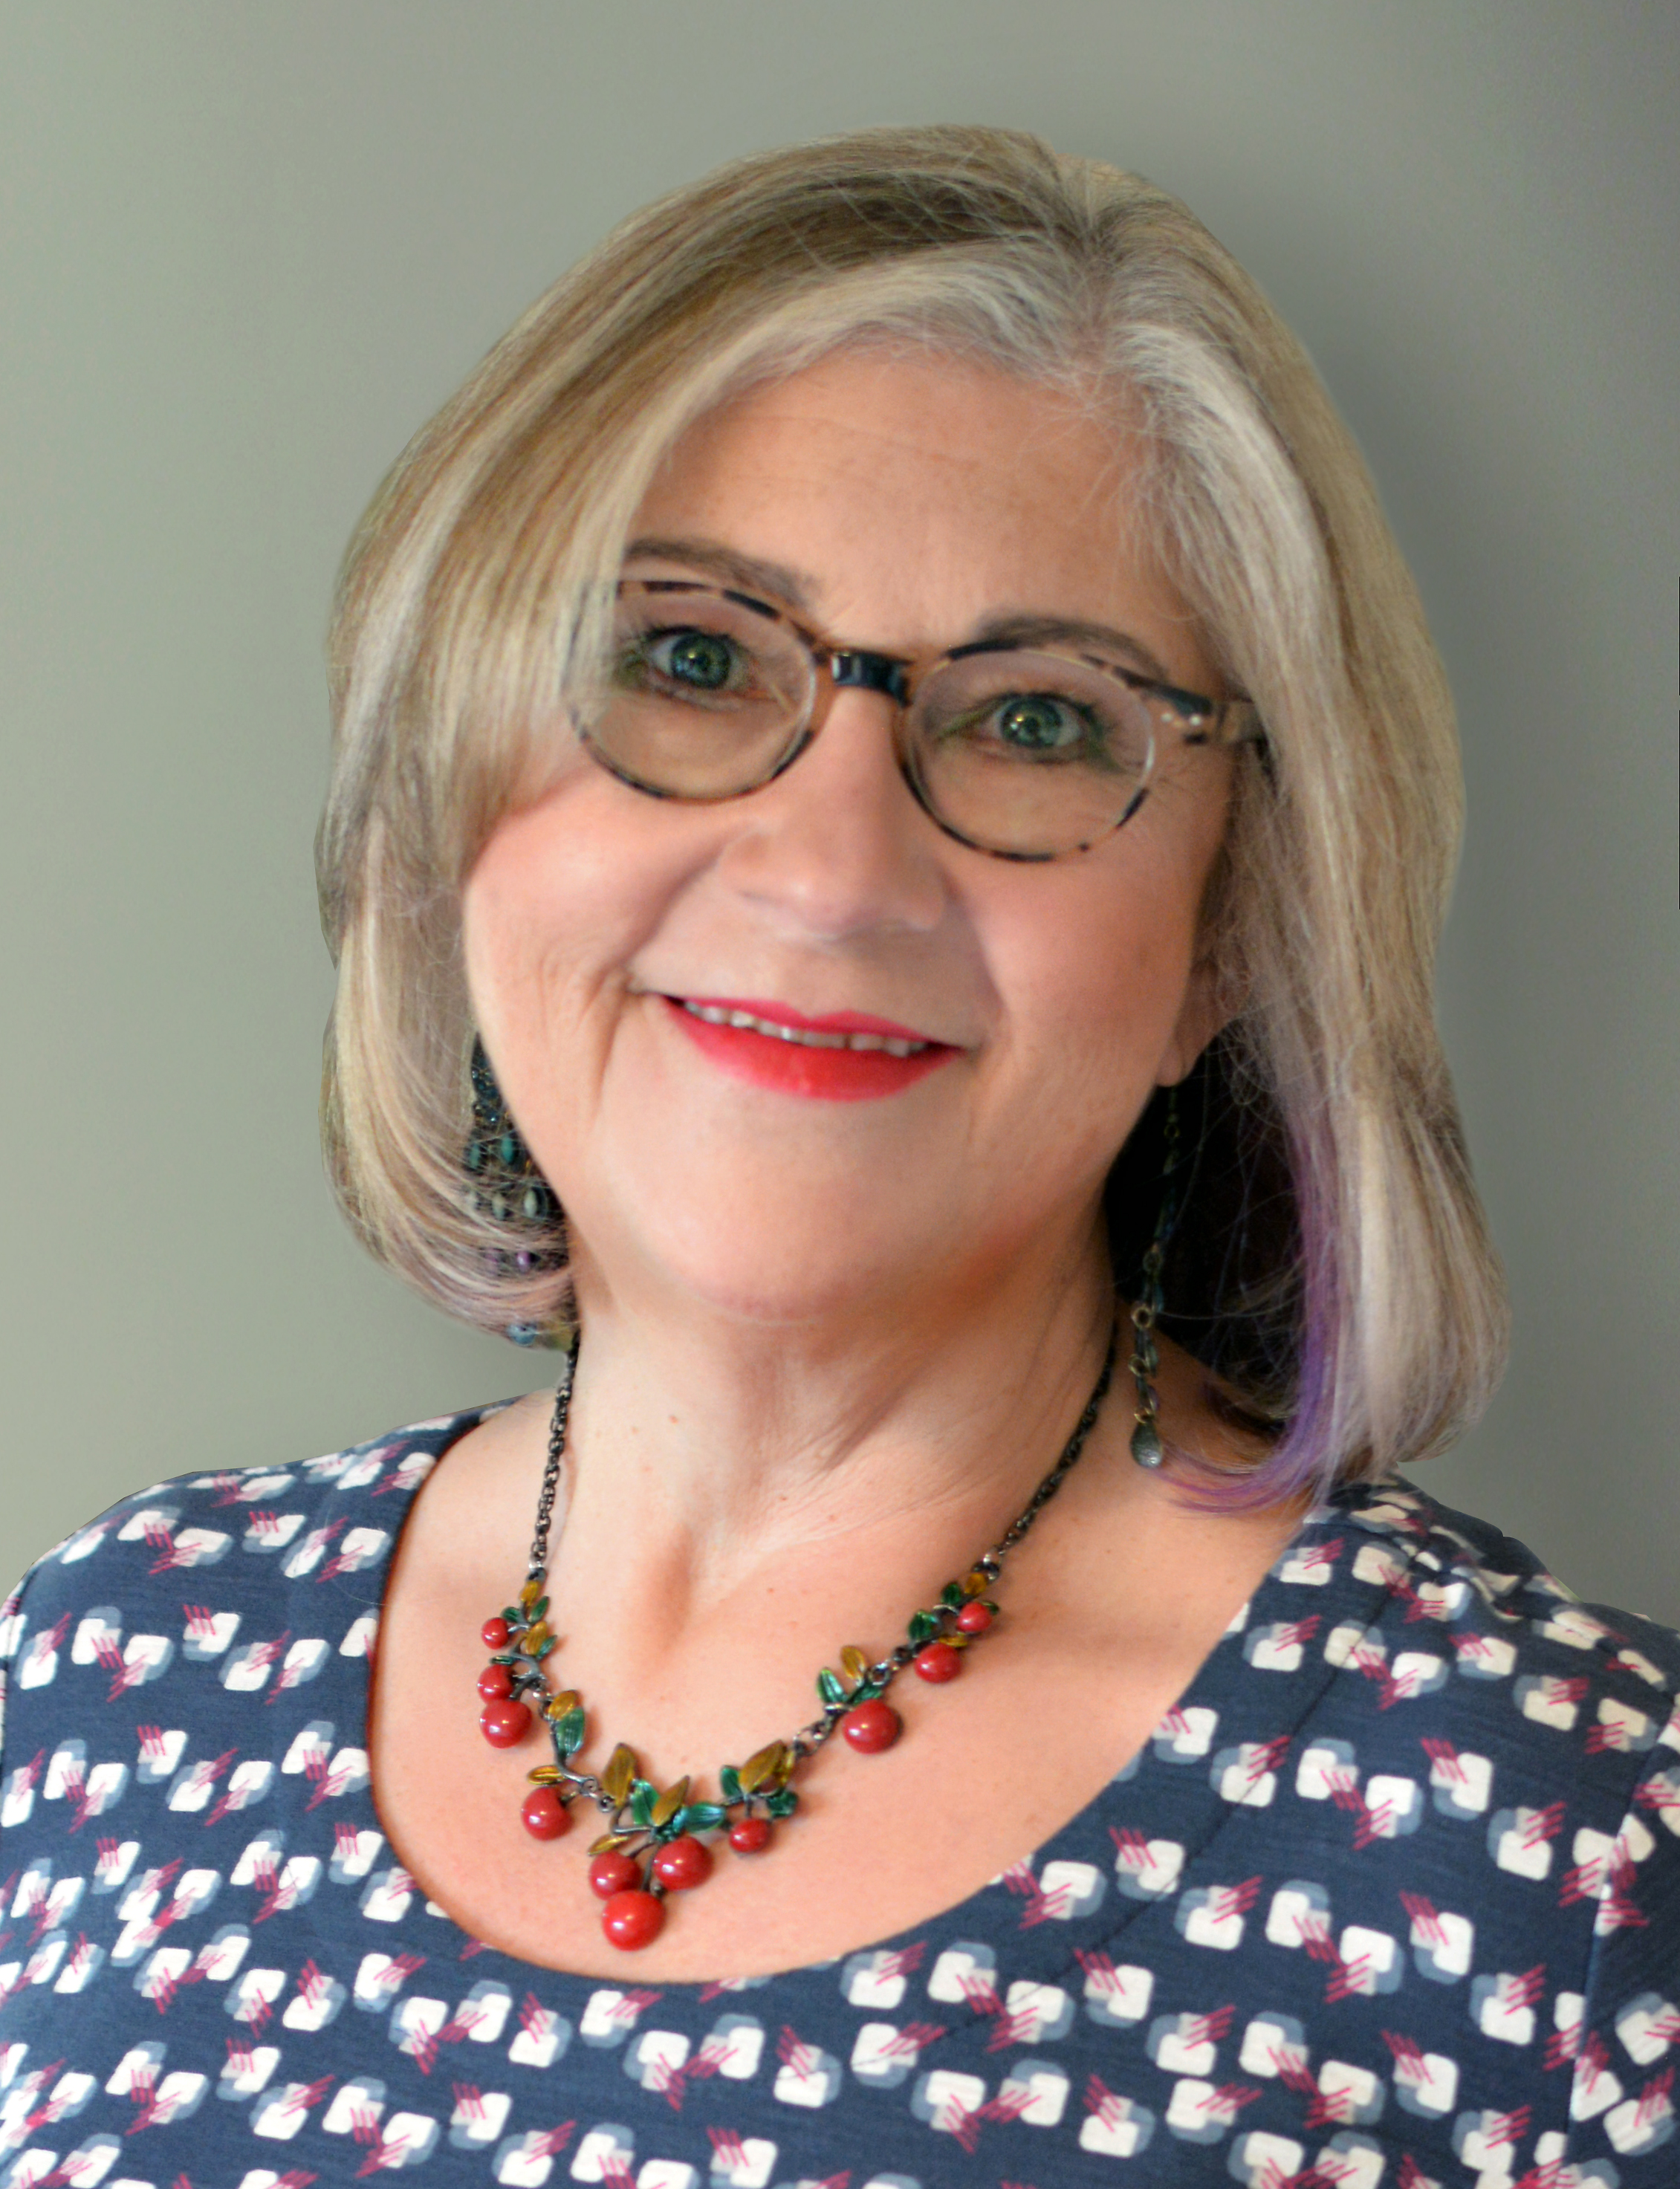 Denise Taylor, MSc, MBA, C.Psychol